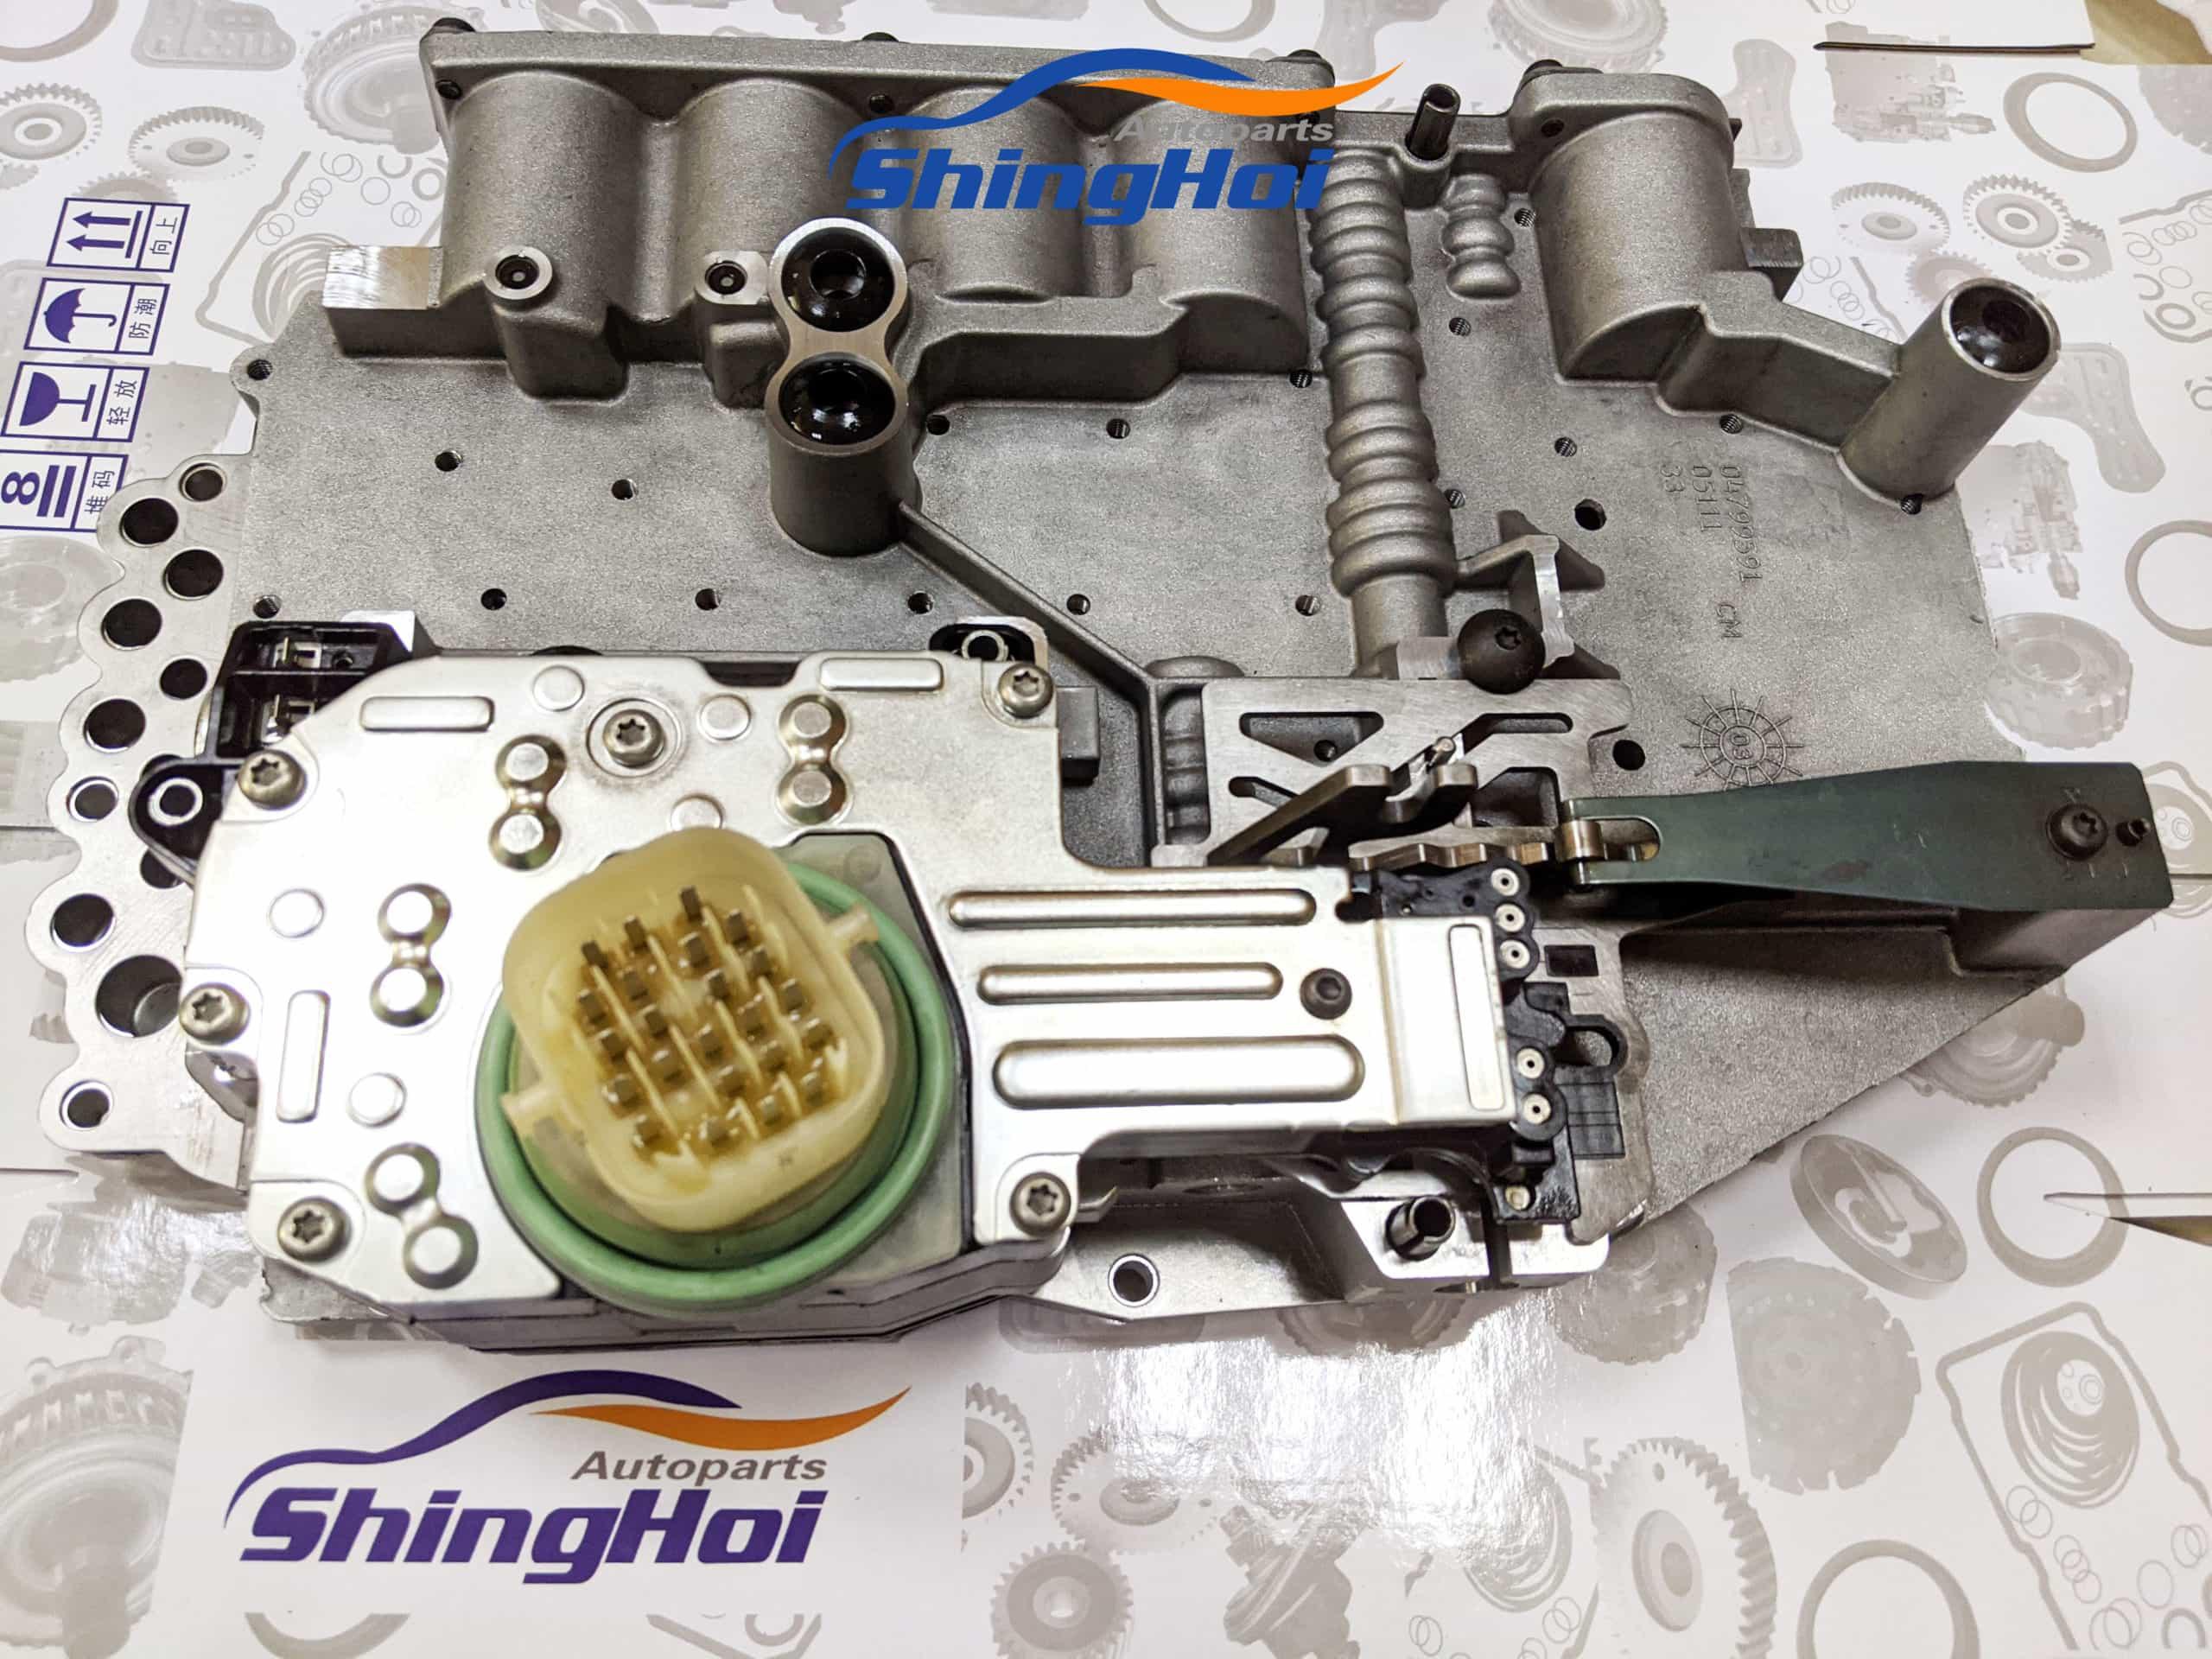 545rfe 68rfe Valve Body And Solenoid Pack 2004 Up Dodge Durango Dakota Sheng Hai Auto Parts Co Ltd